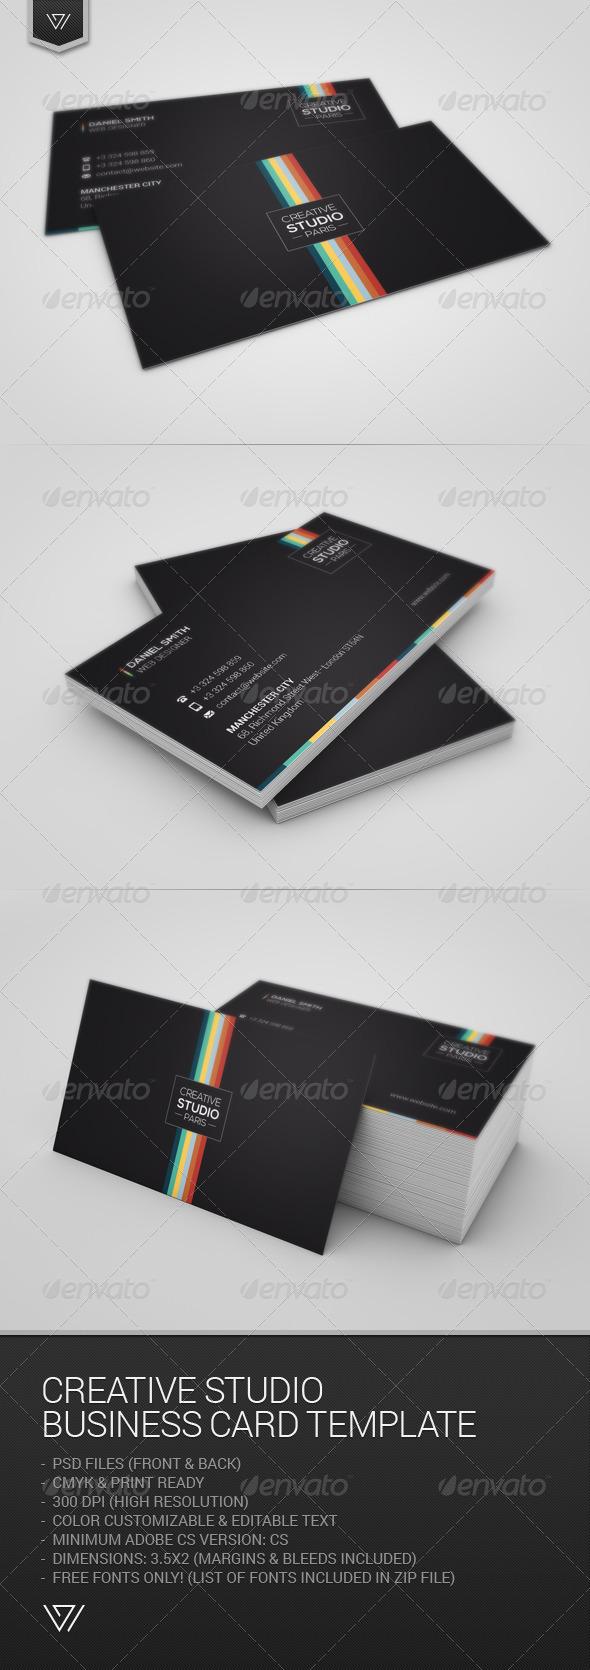 GraphicRiver Creative Studio Business Card 7721973